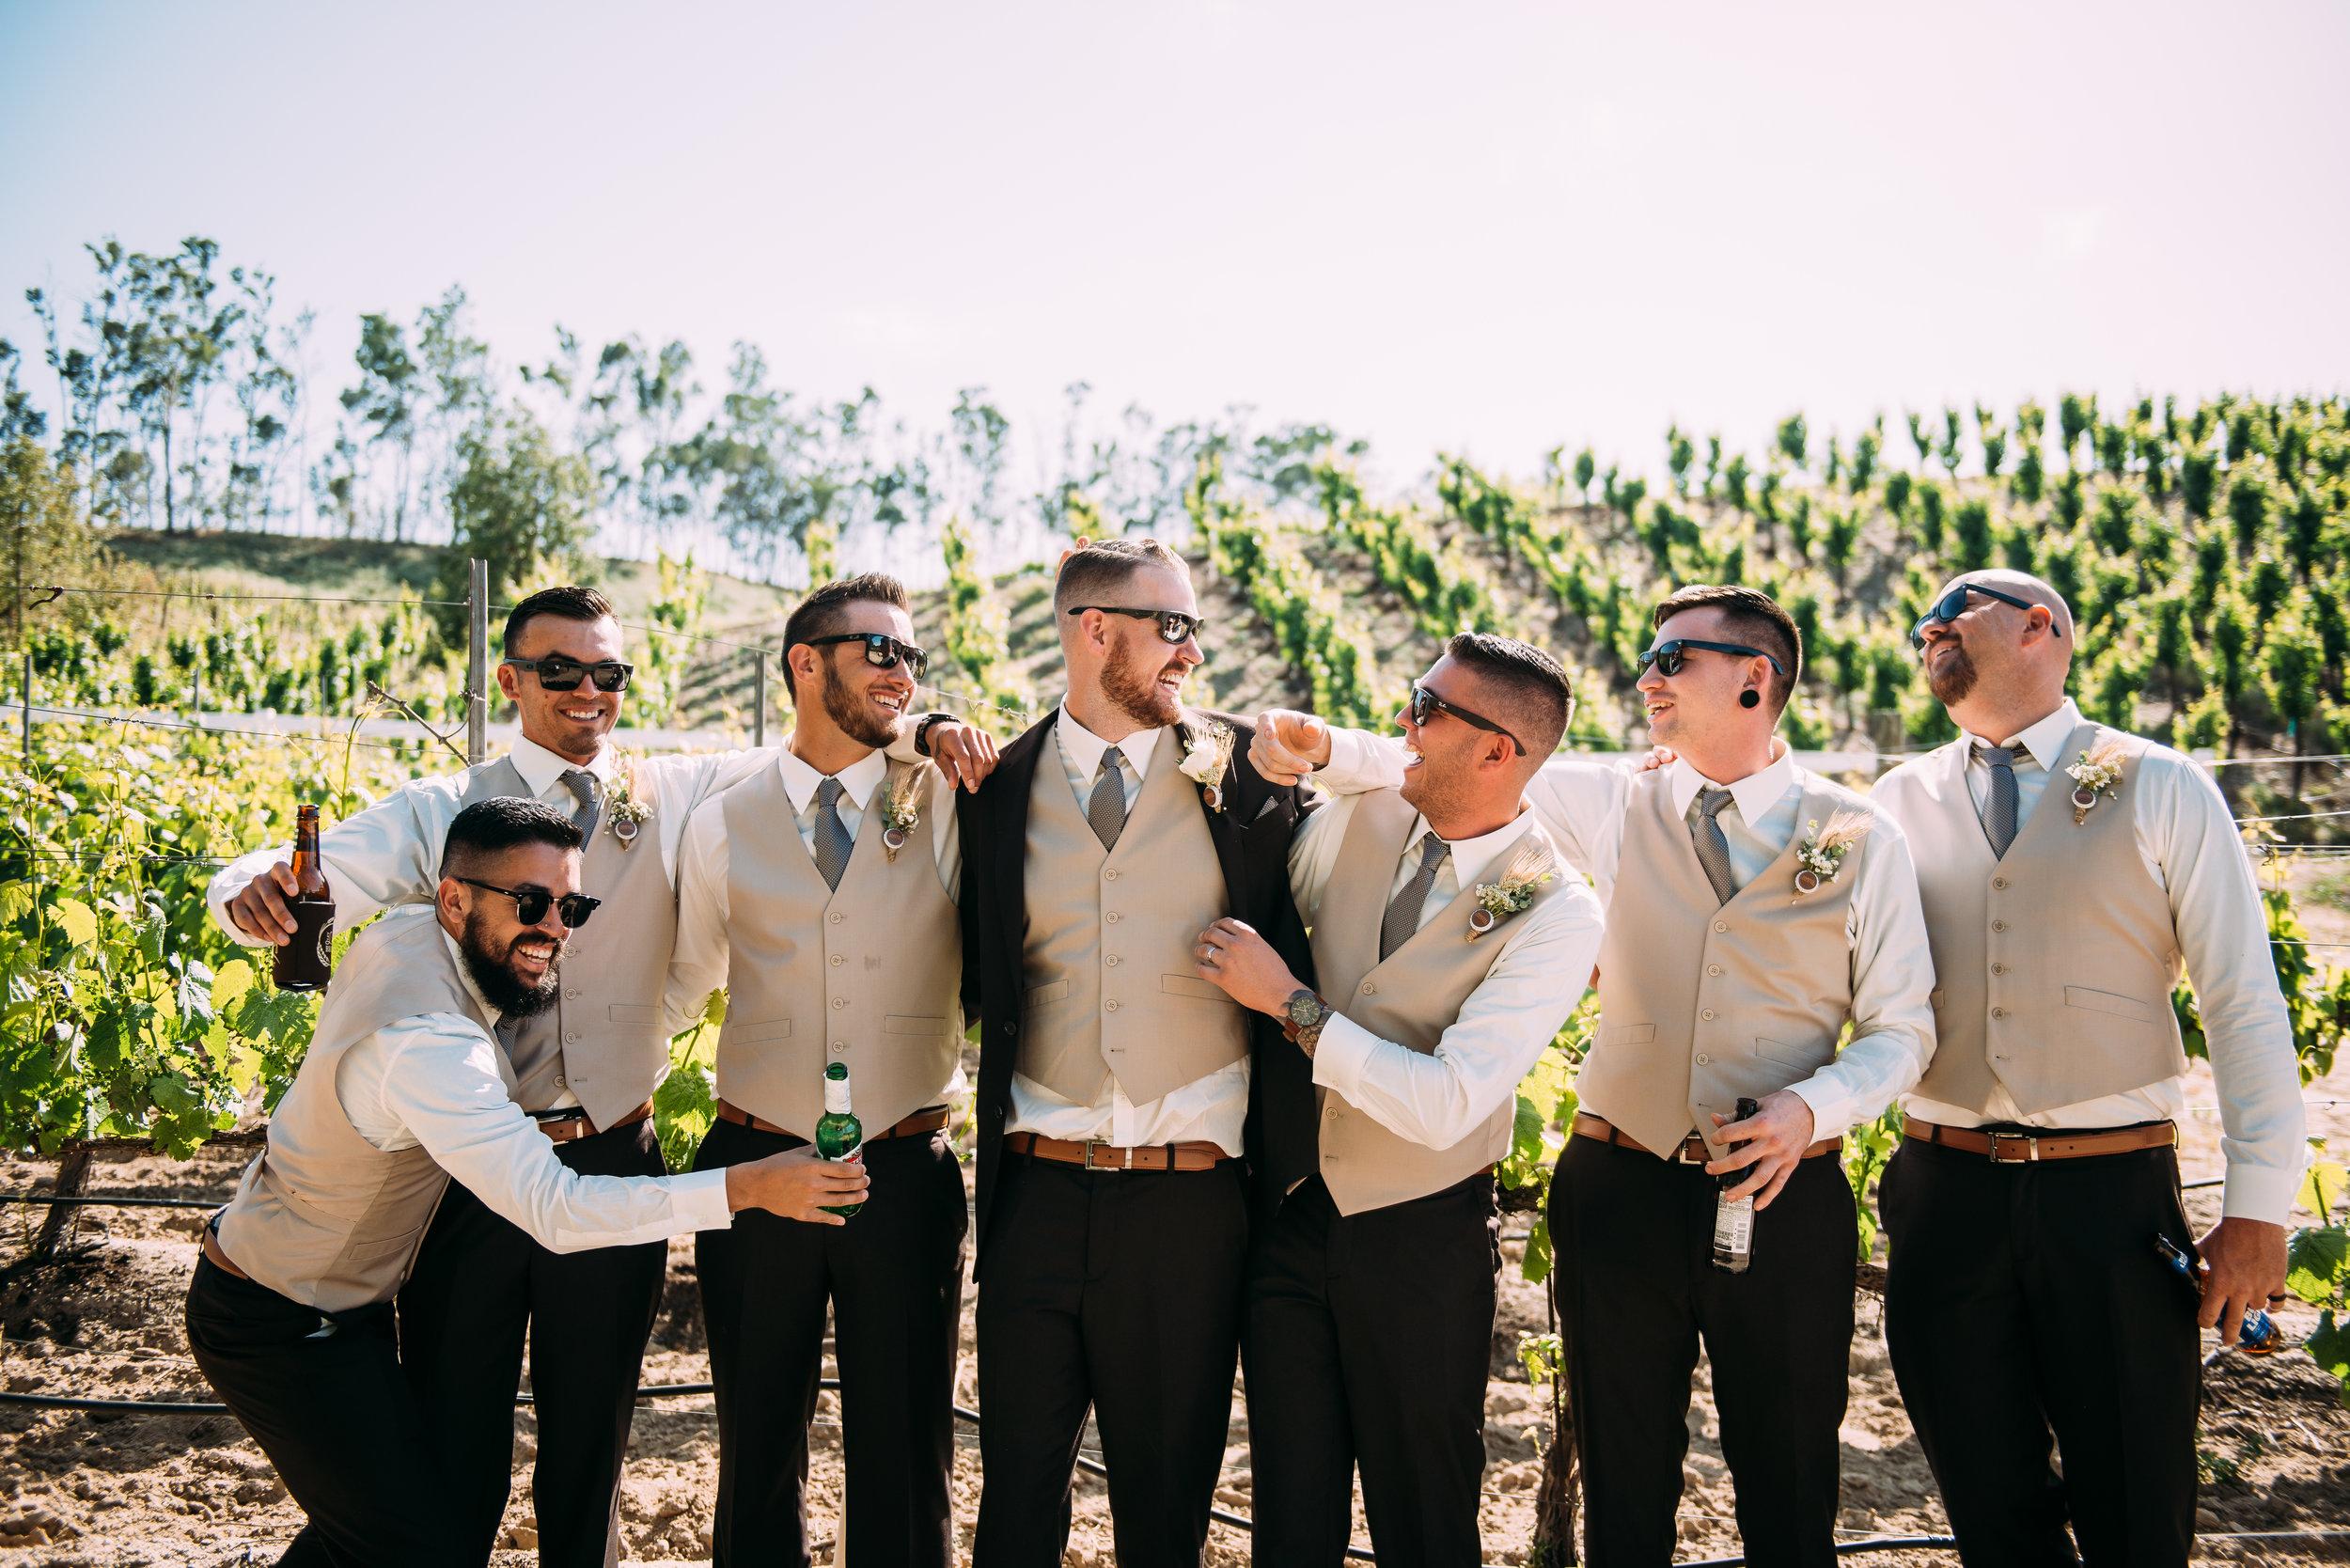 AS-Long-Shadow-Ranch-Temecula-Wedding-Photography 164.jpg